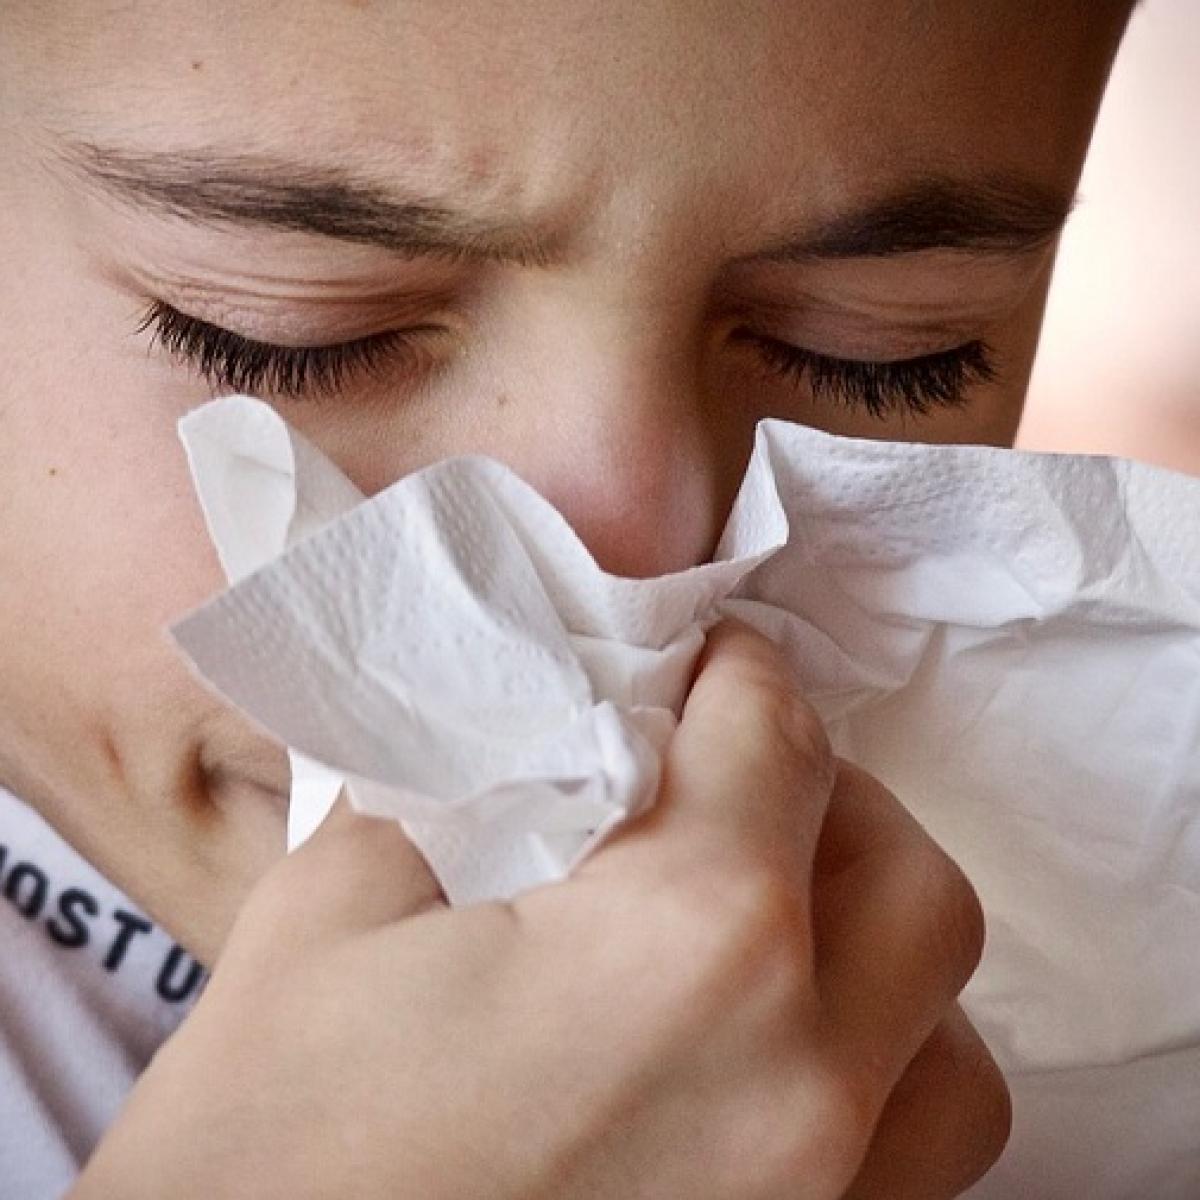 Coronavirus outbreak: Indigestion drug may help treat mild COVID-19 symptoms